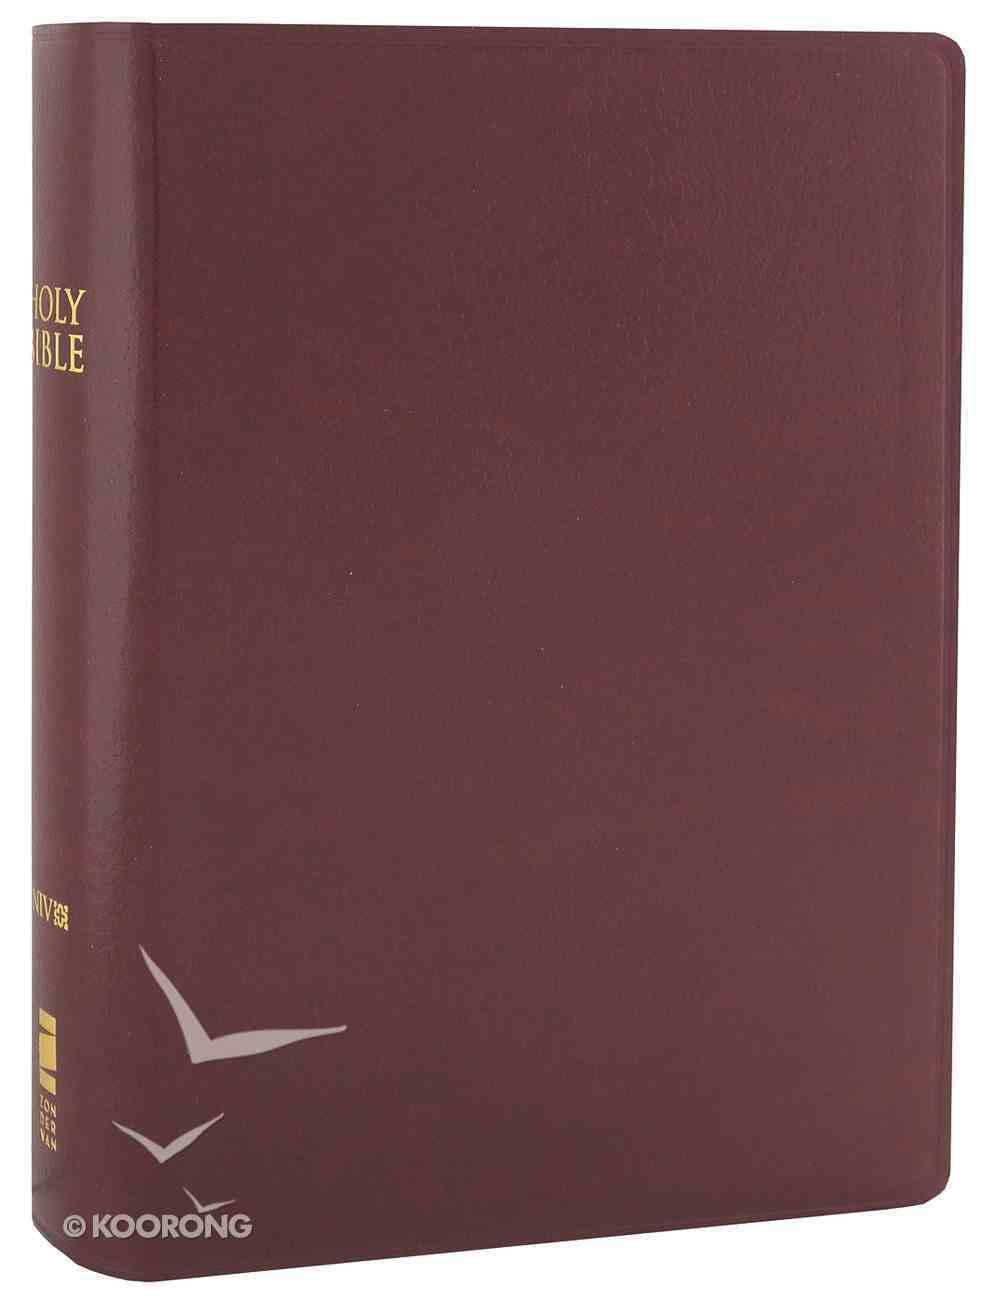 NIV Compact Giant Print Burgundy (Black Letter Edition) Imitation Leather